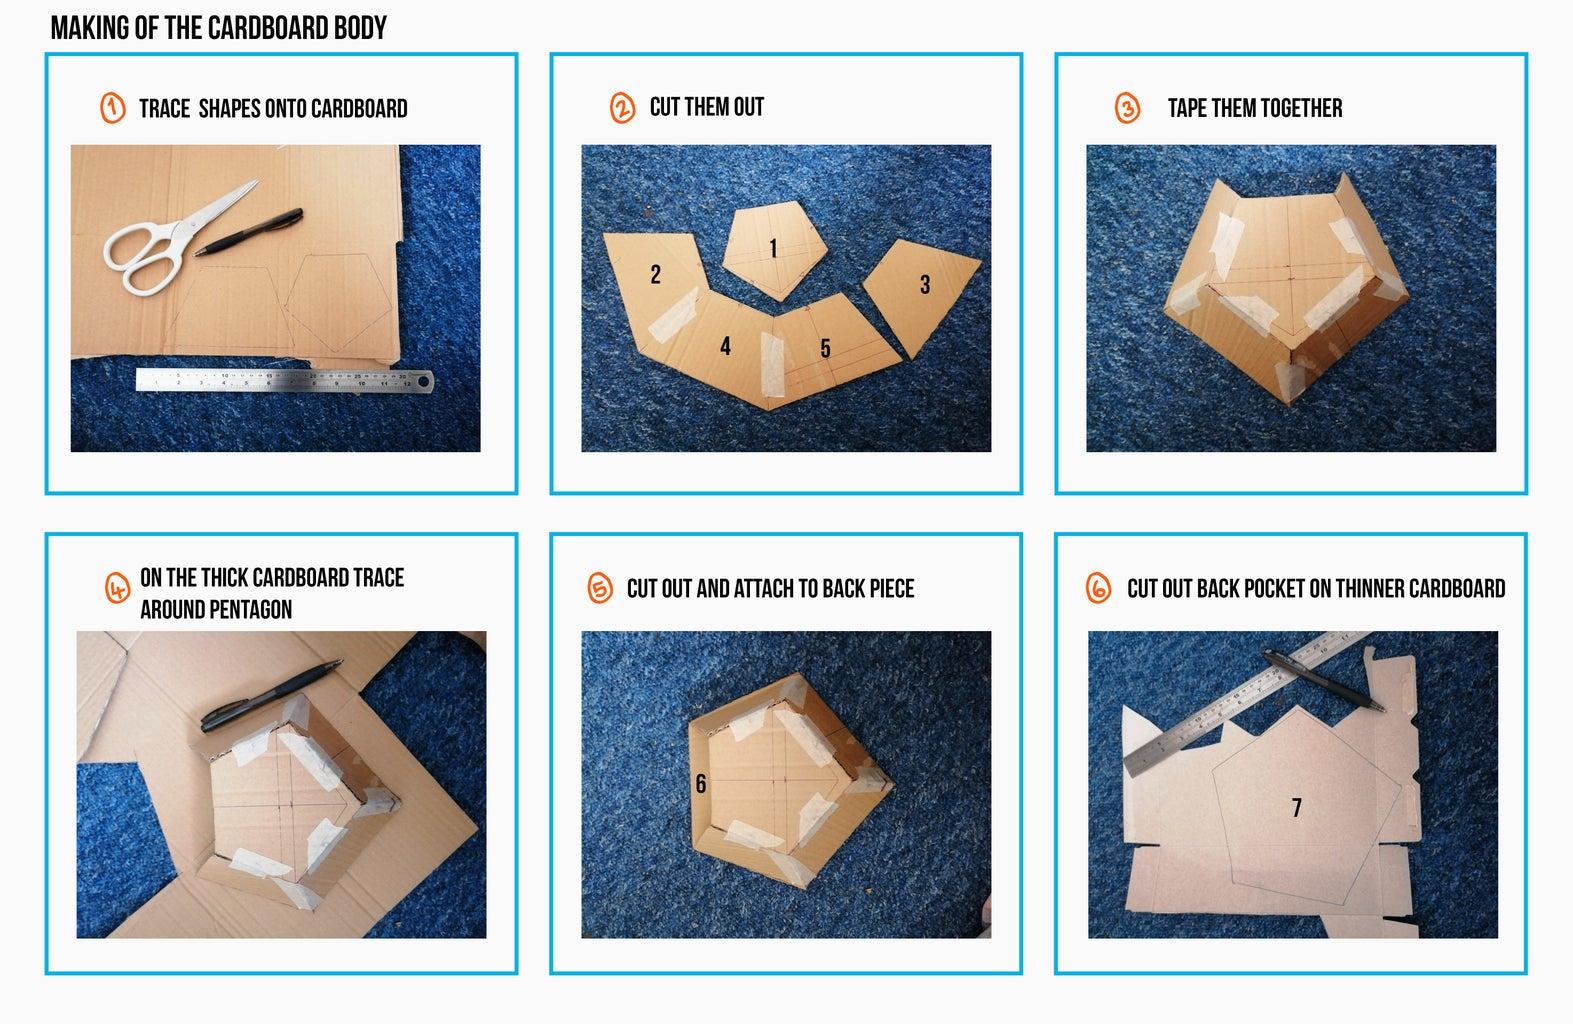 Making the Cardboard Body